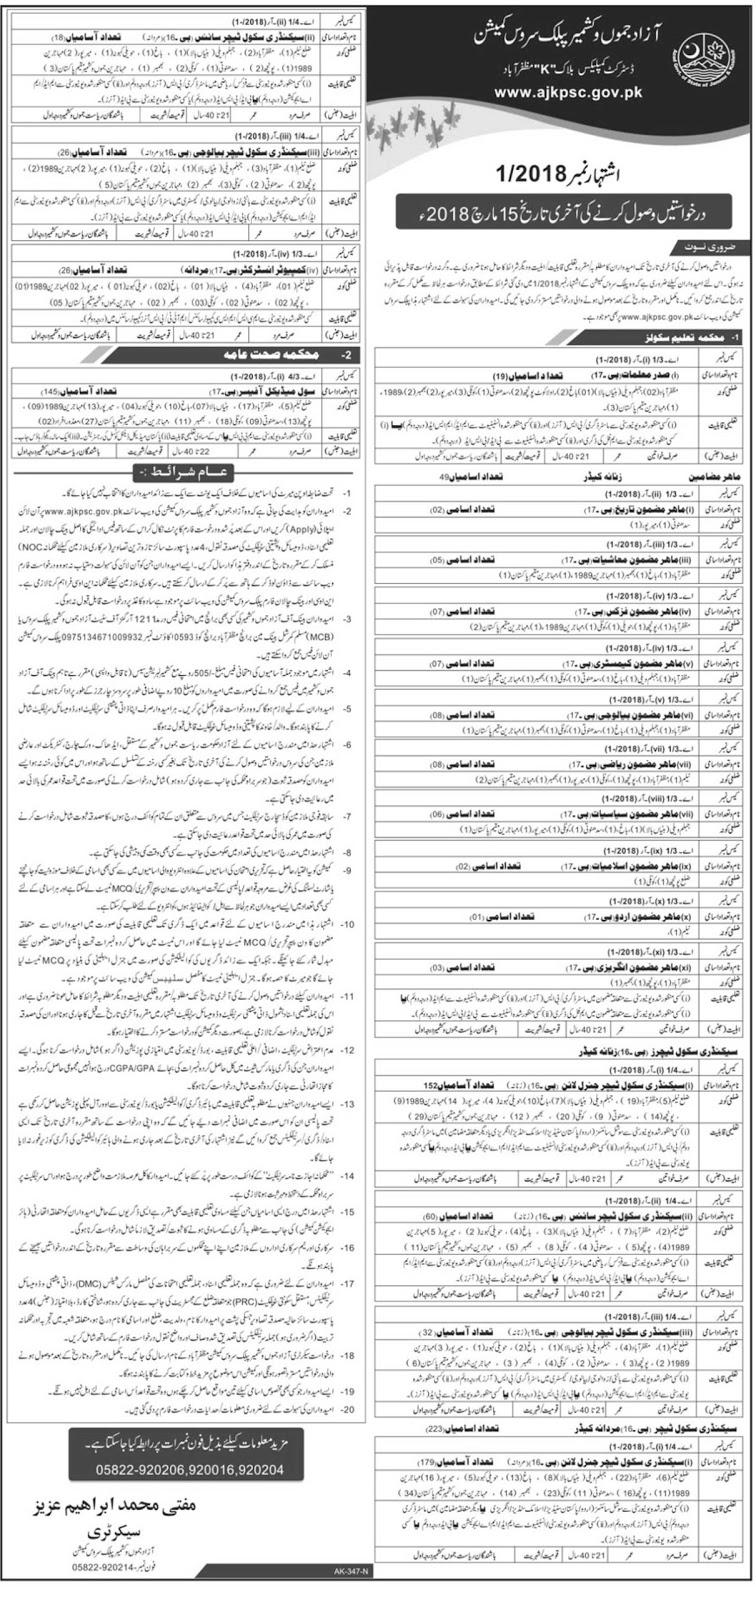 978 Jobs In Azad Jammu And Kashmir Public Service Commission - AJKPSC Jobs 2018